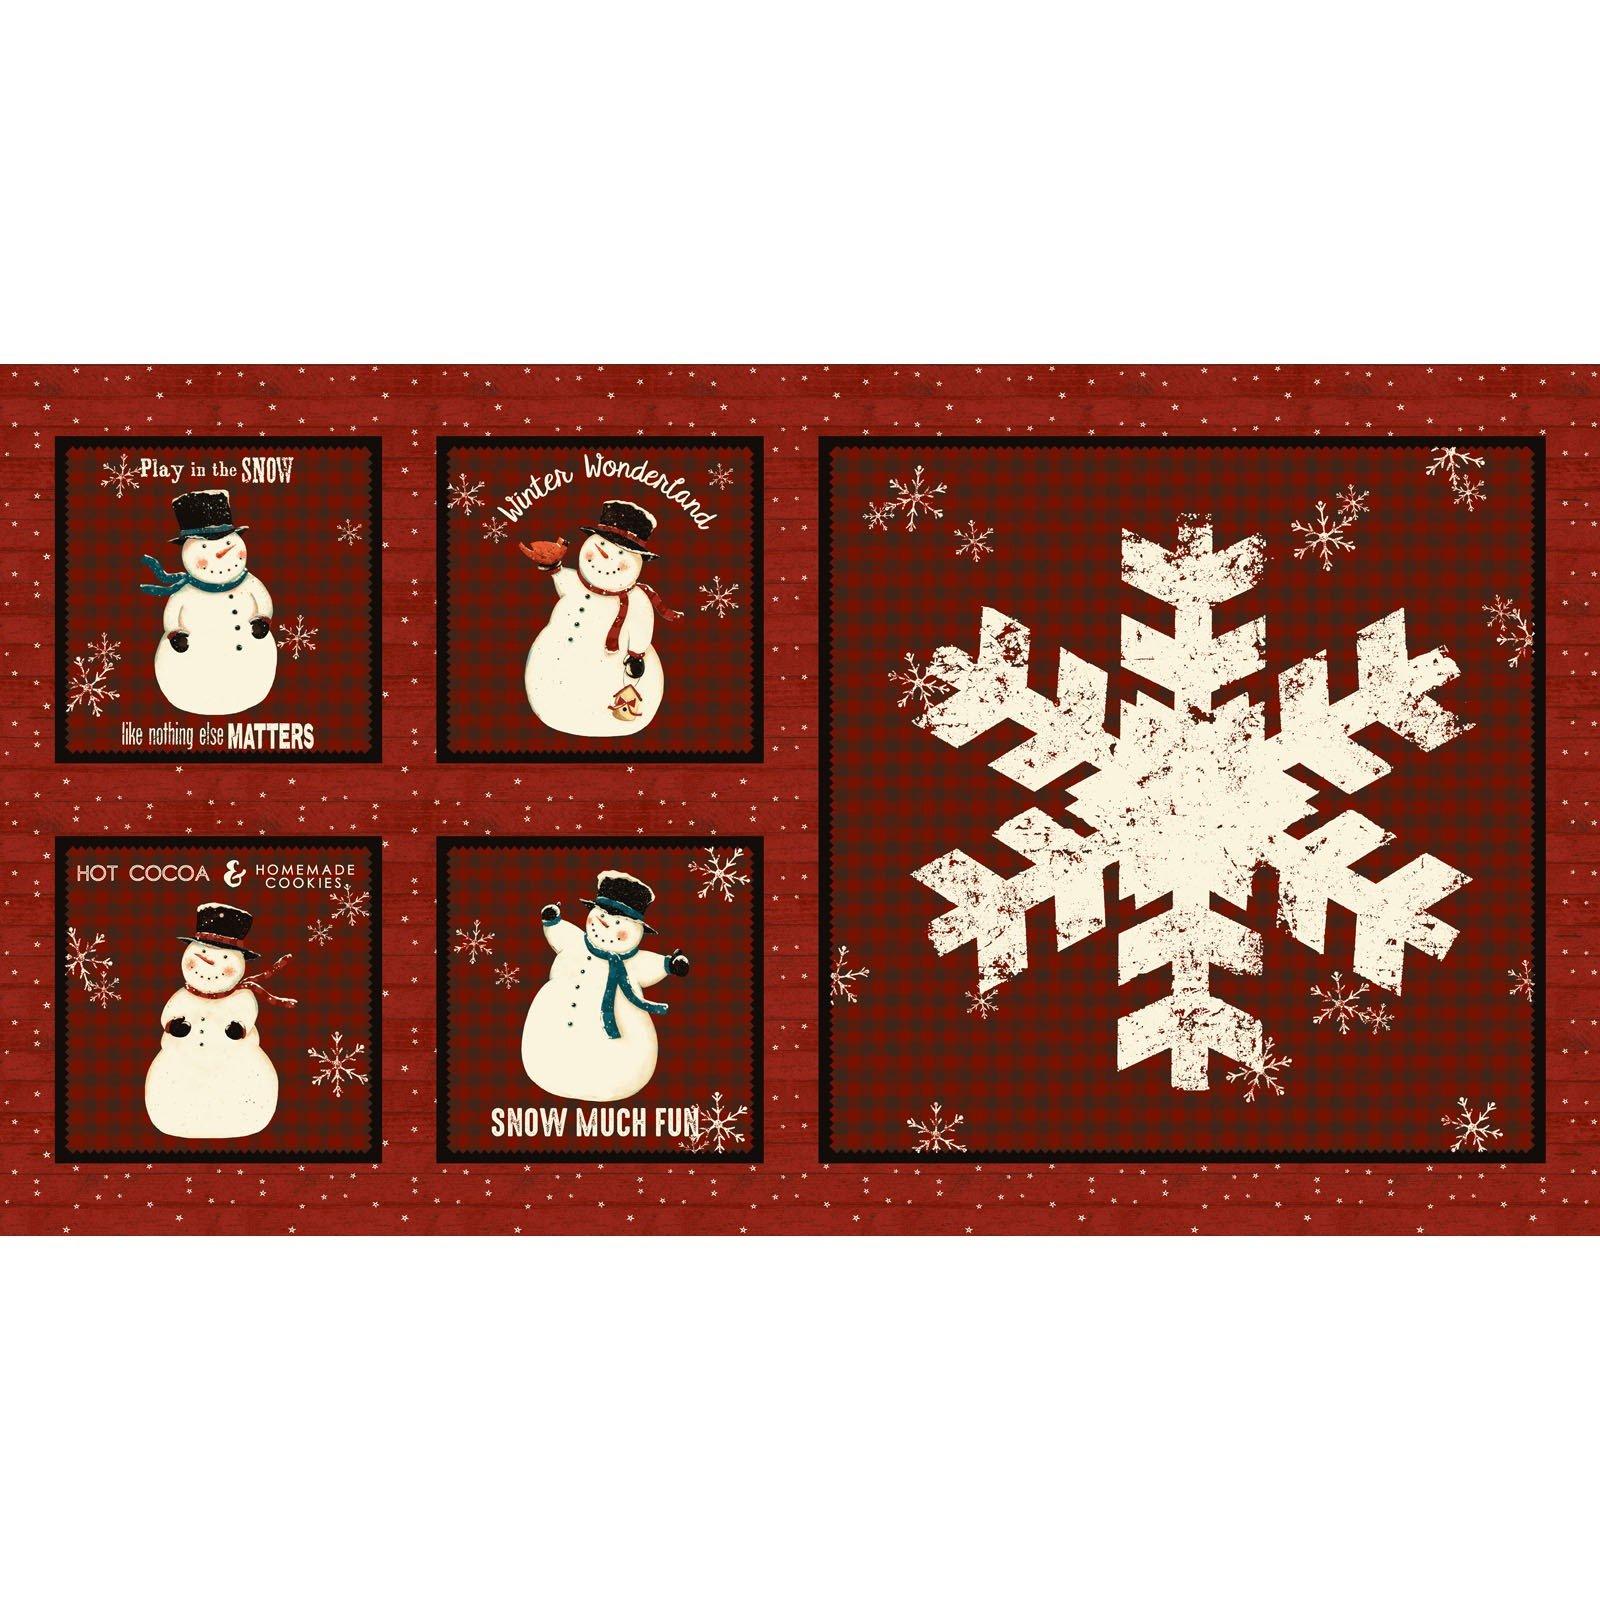 Snow Much Fun Panel<br/>Clothworks 2211-82